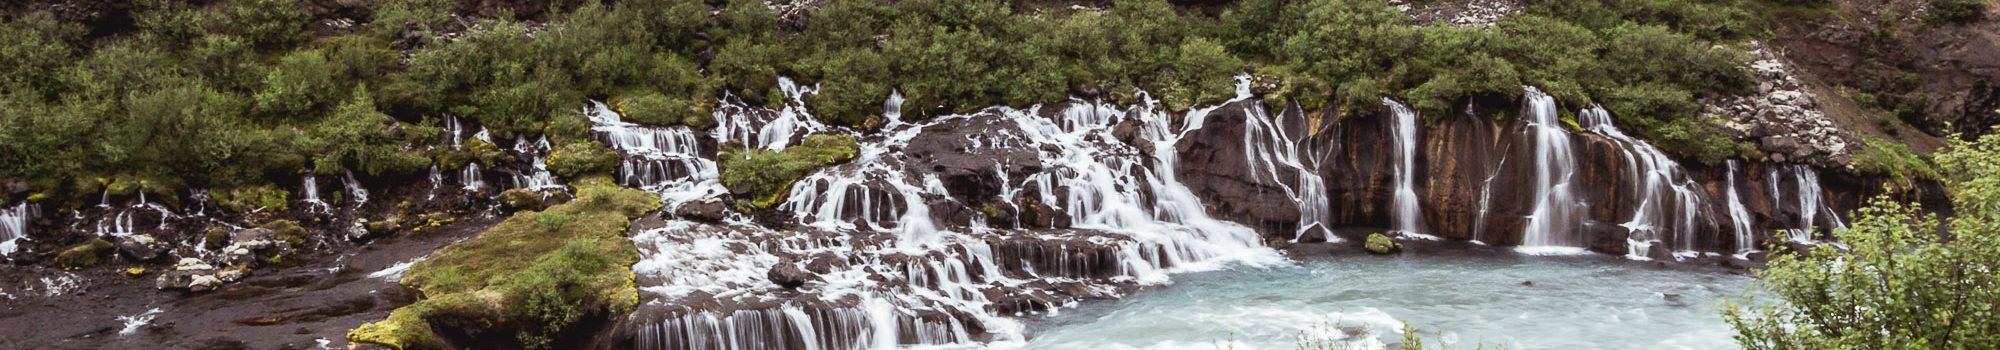 Hraunfossar-Snaefellsnes-West-Iceland-tour